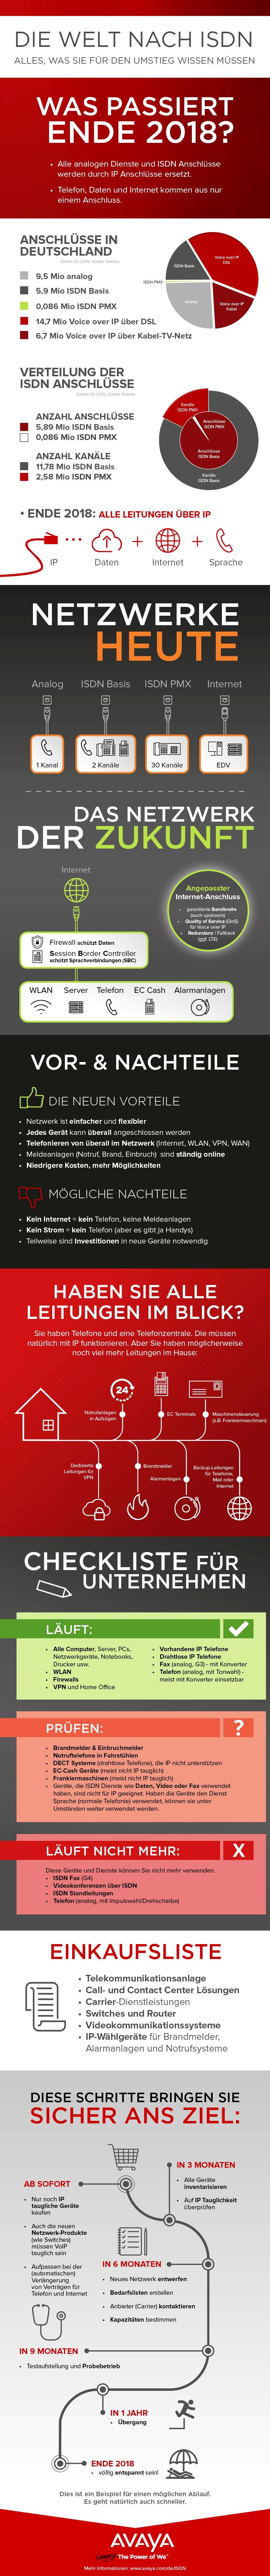 infografik avaya isdn